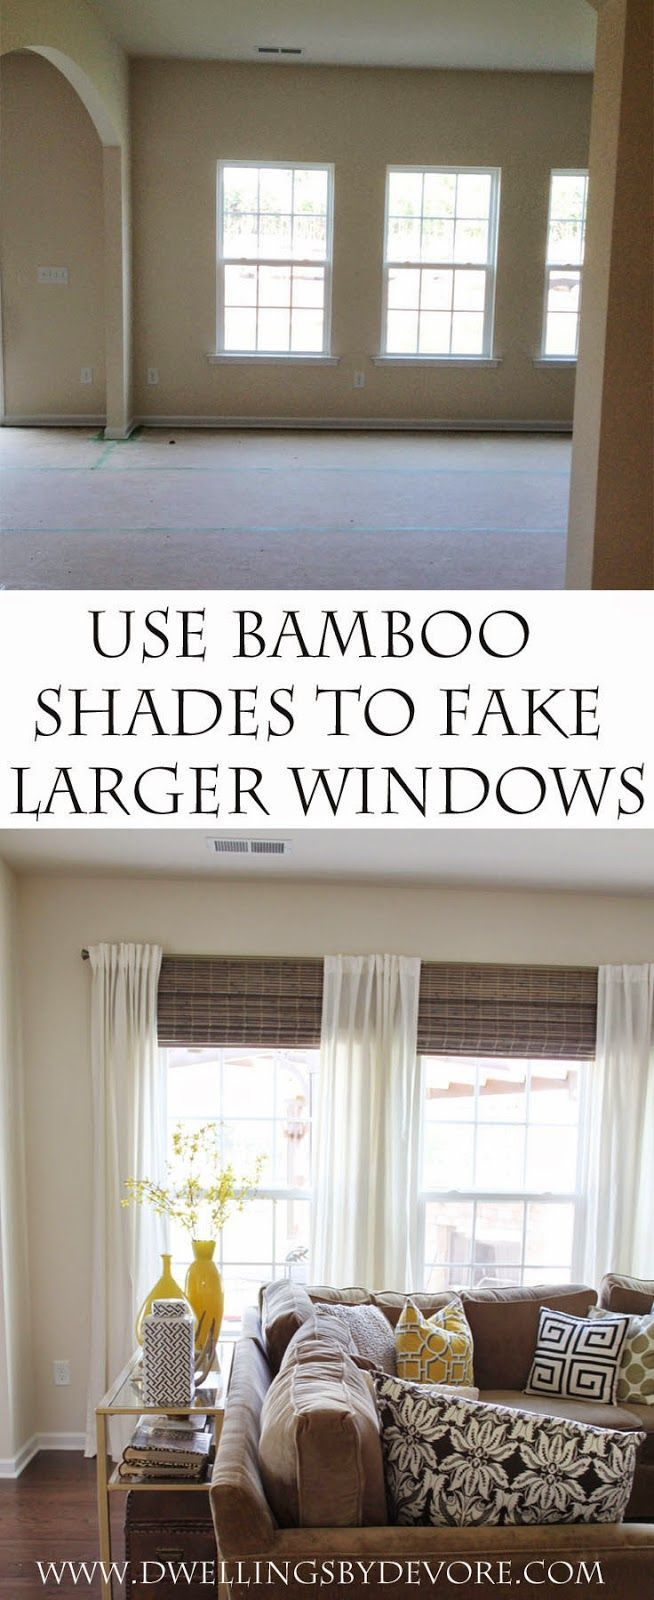 1000 Ideas About Bathroom Window Curtains On Pinterest Fabric Shower Curtains Window